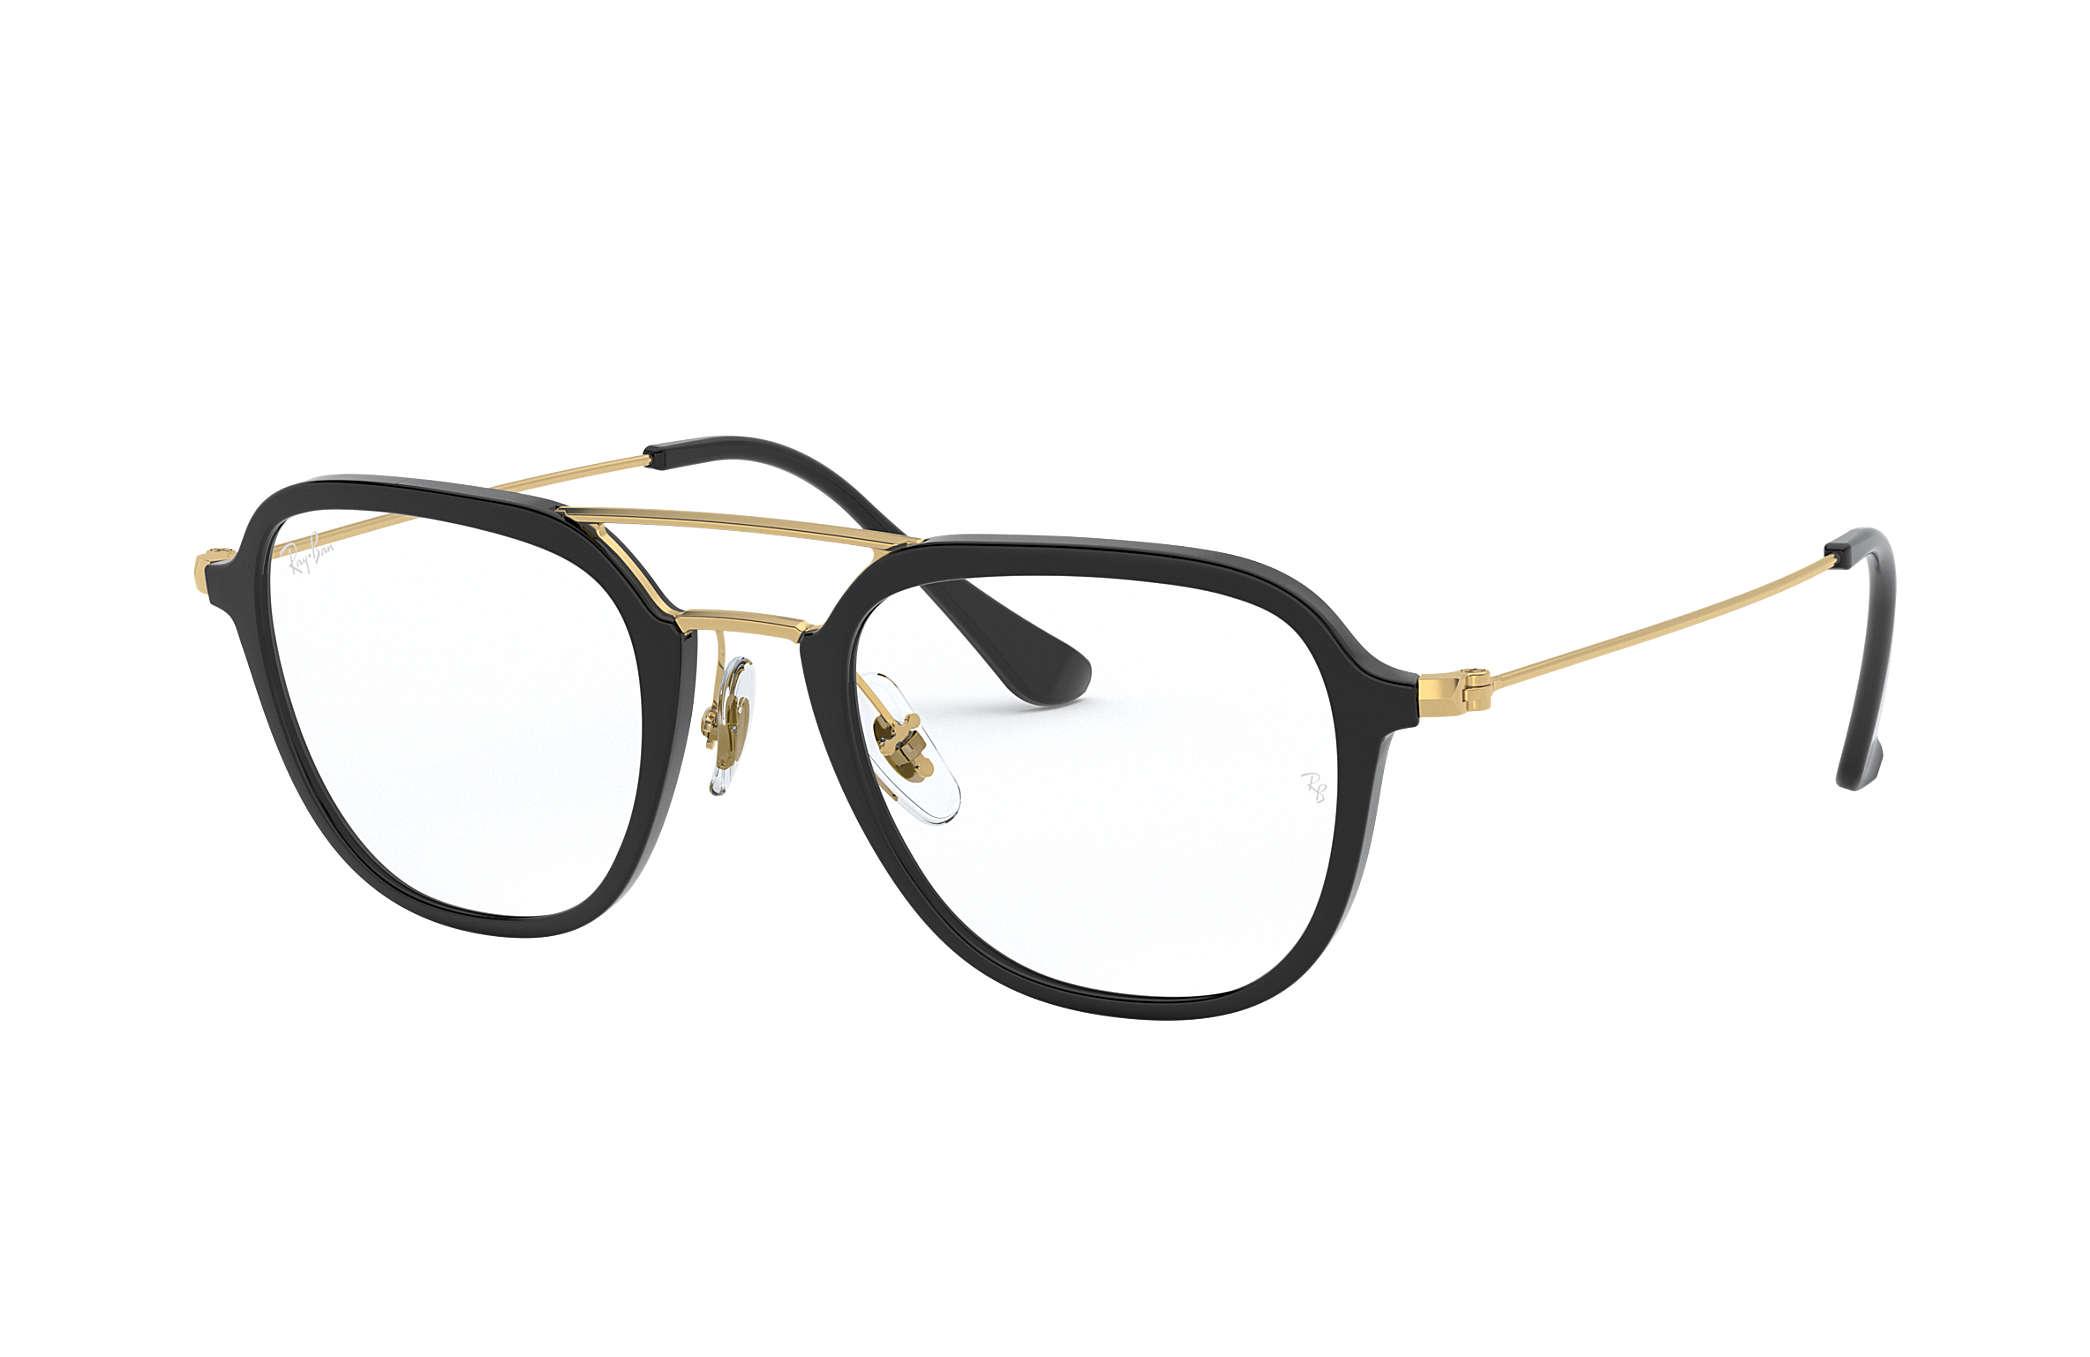 35a25401f3f5 Ray-Ban prescription glasses RB7098 Black - Injected - 0RX7098200048 ...